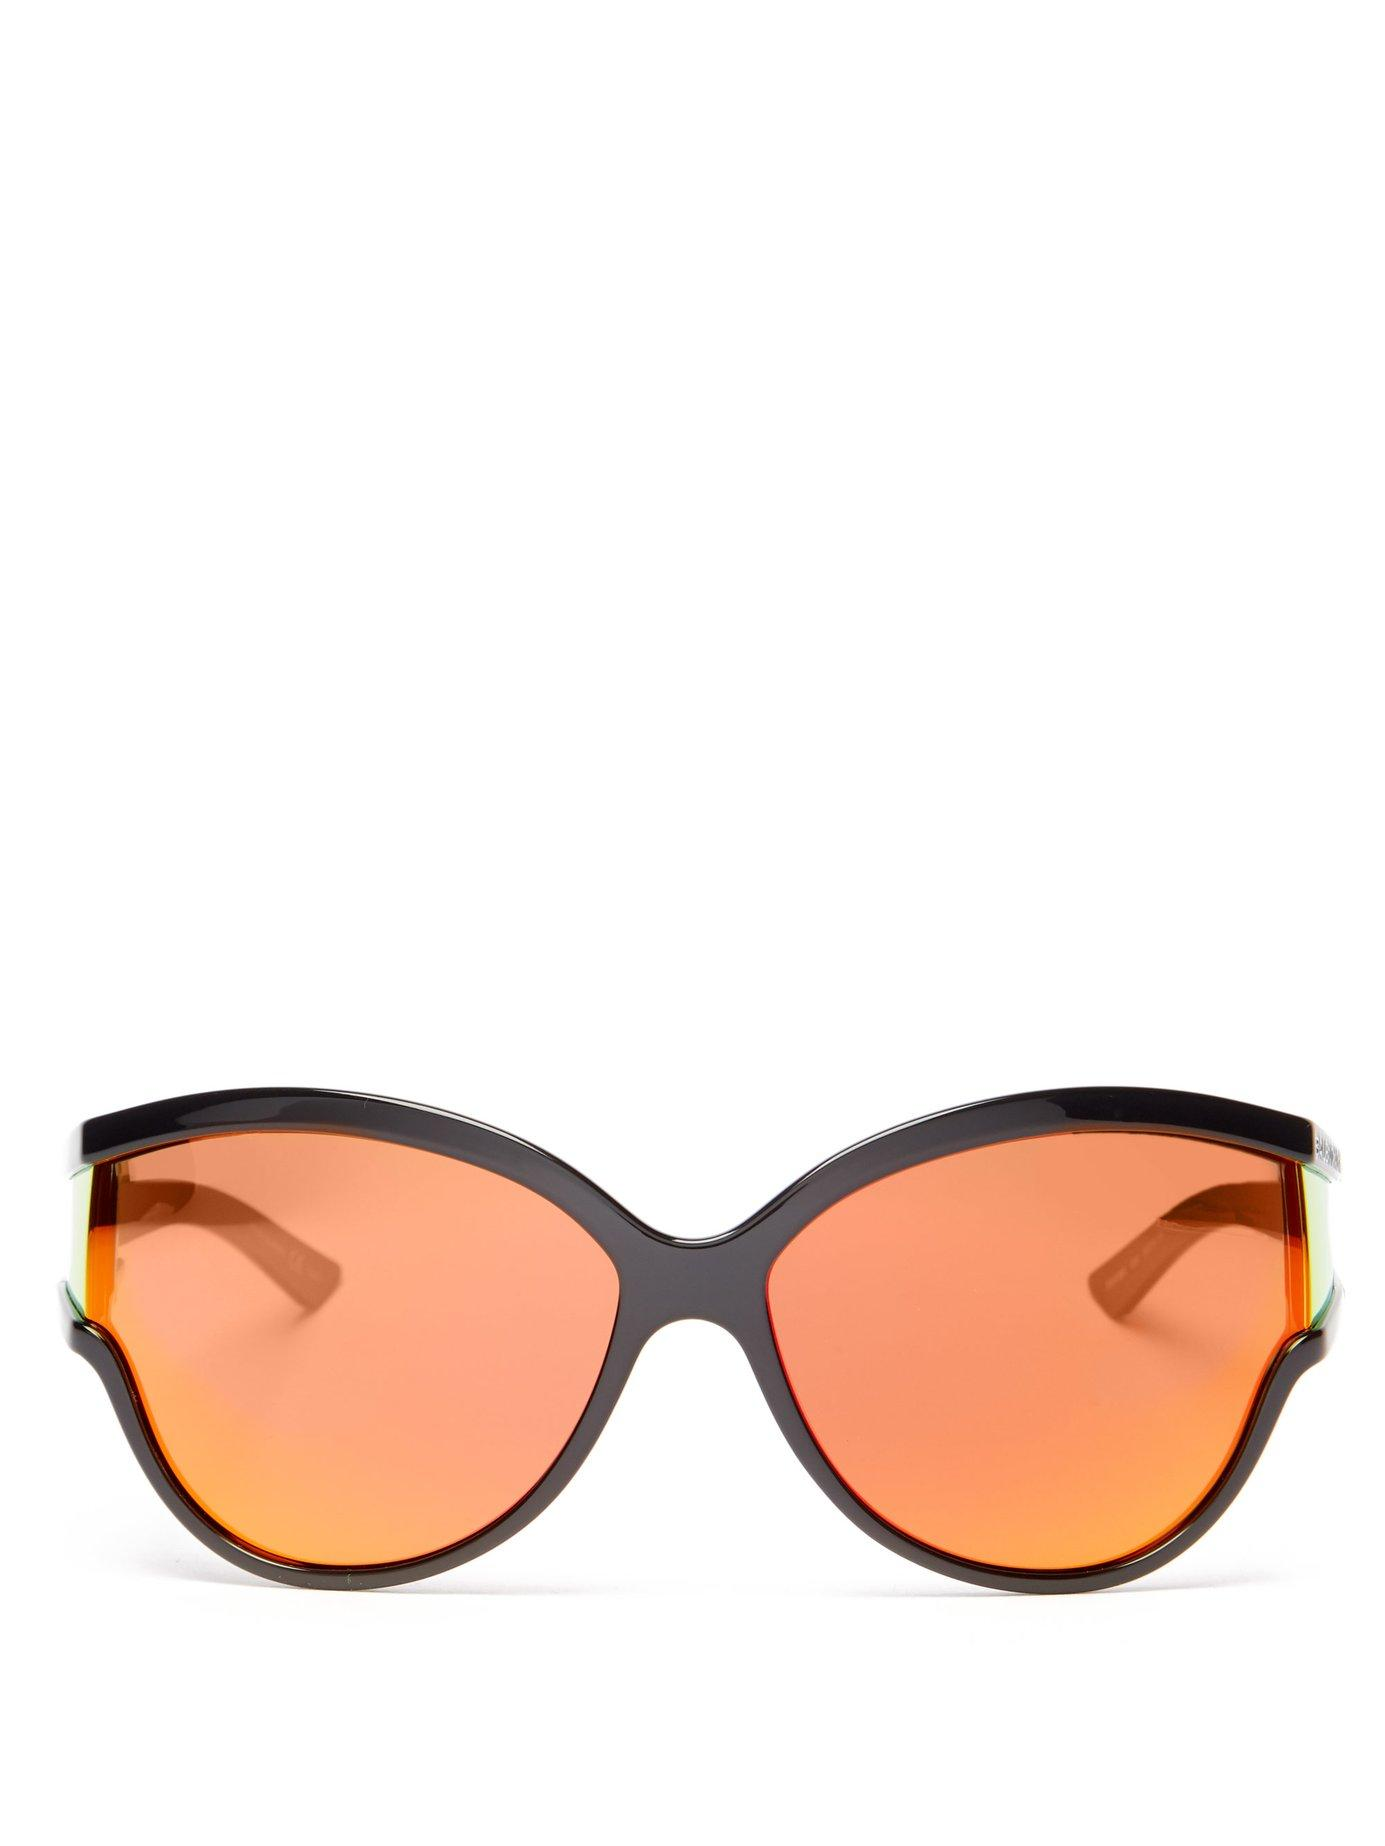 f75354a67f Balenciaga Ski Reflective Cat Eye Sunglasses in Orange - Lyst